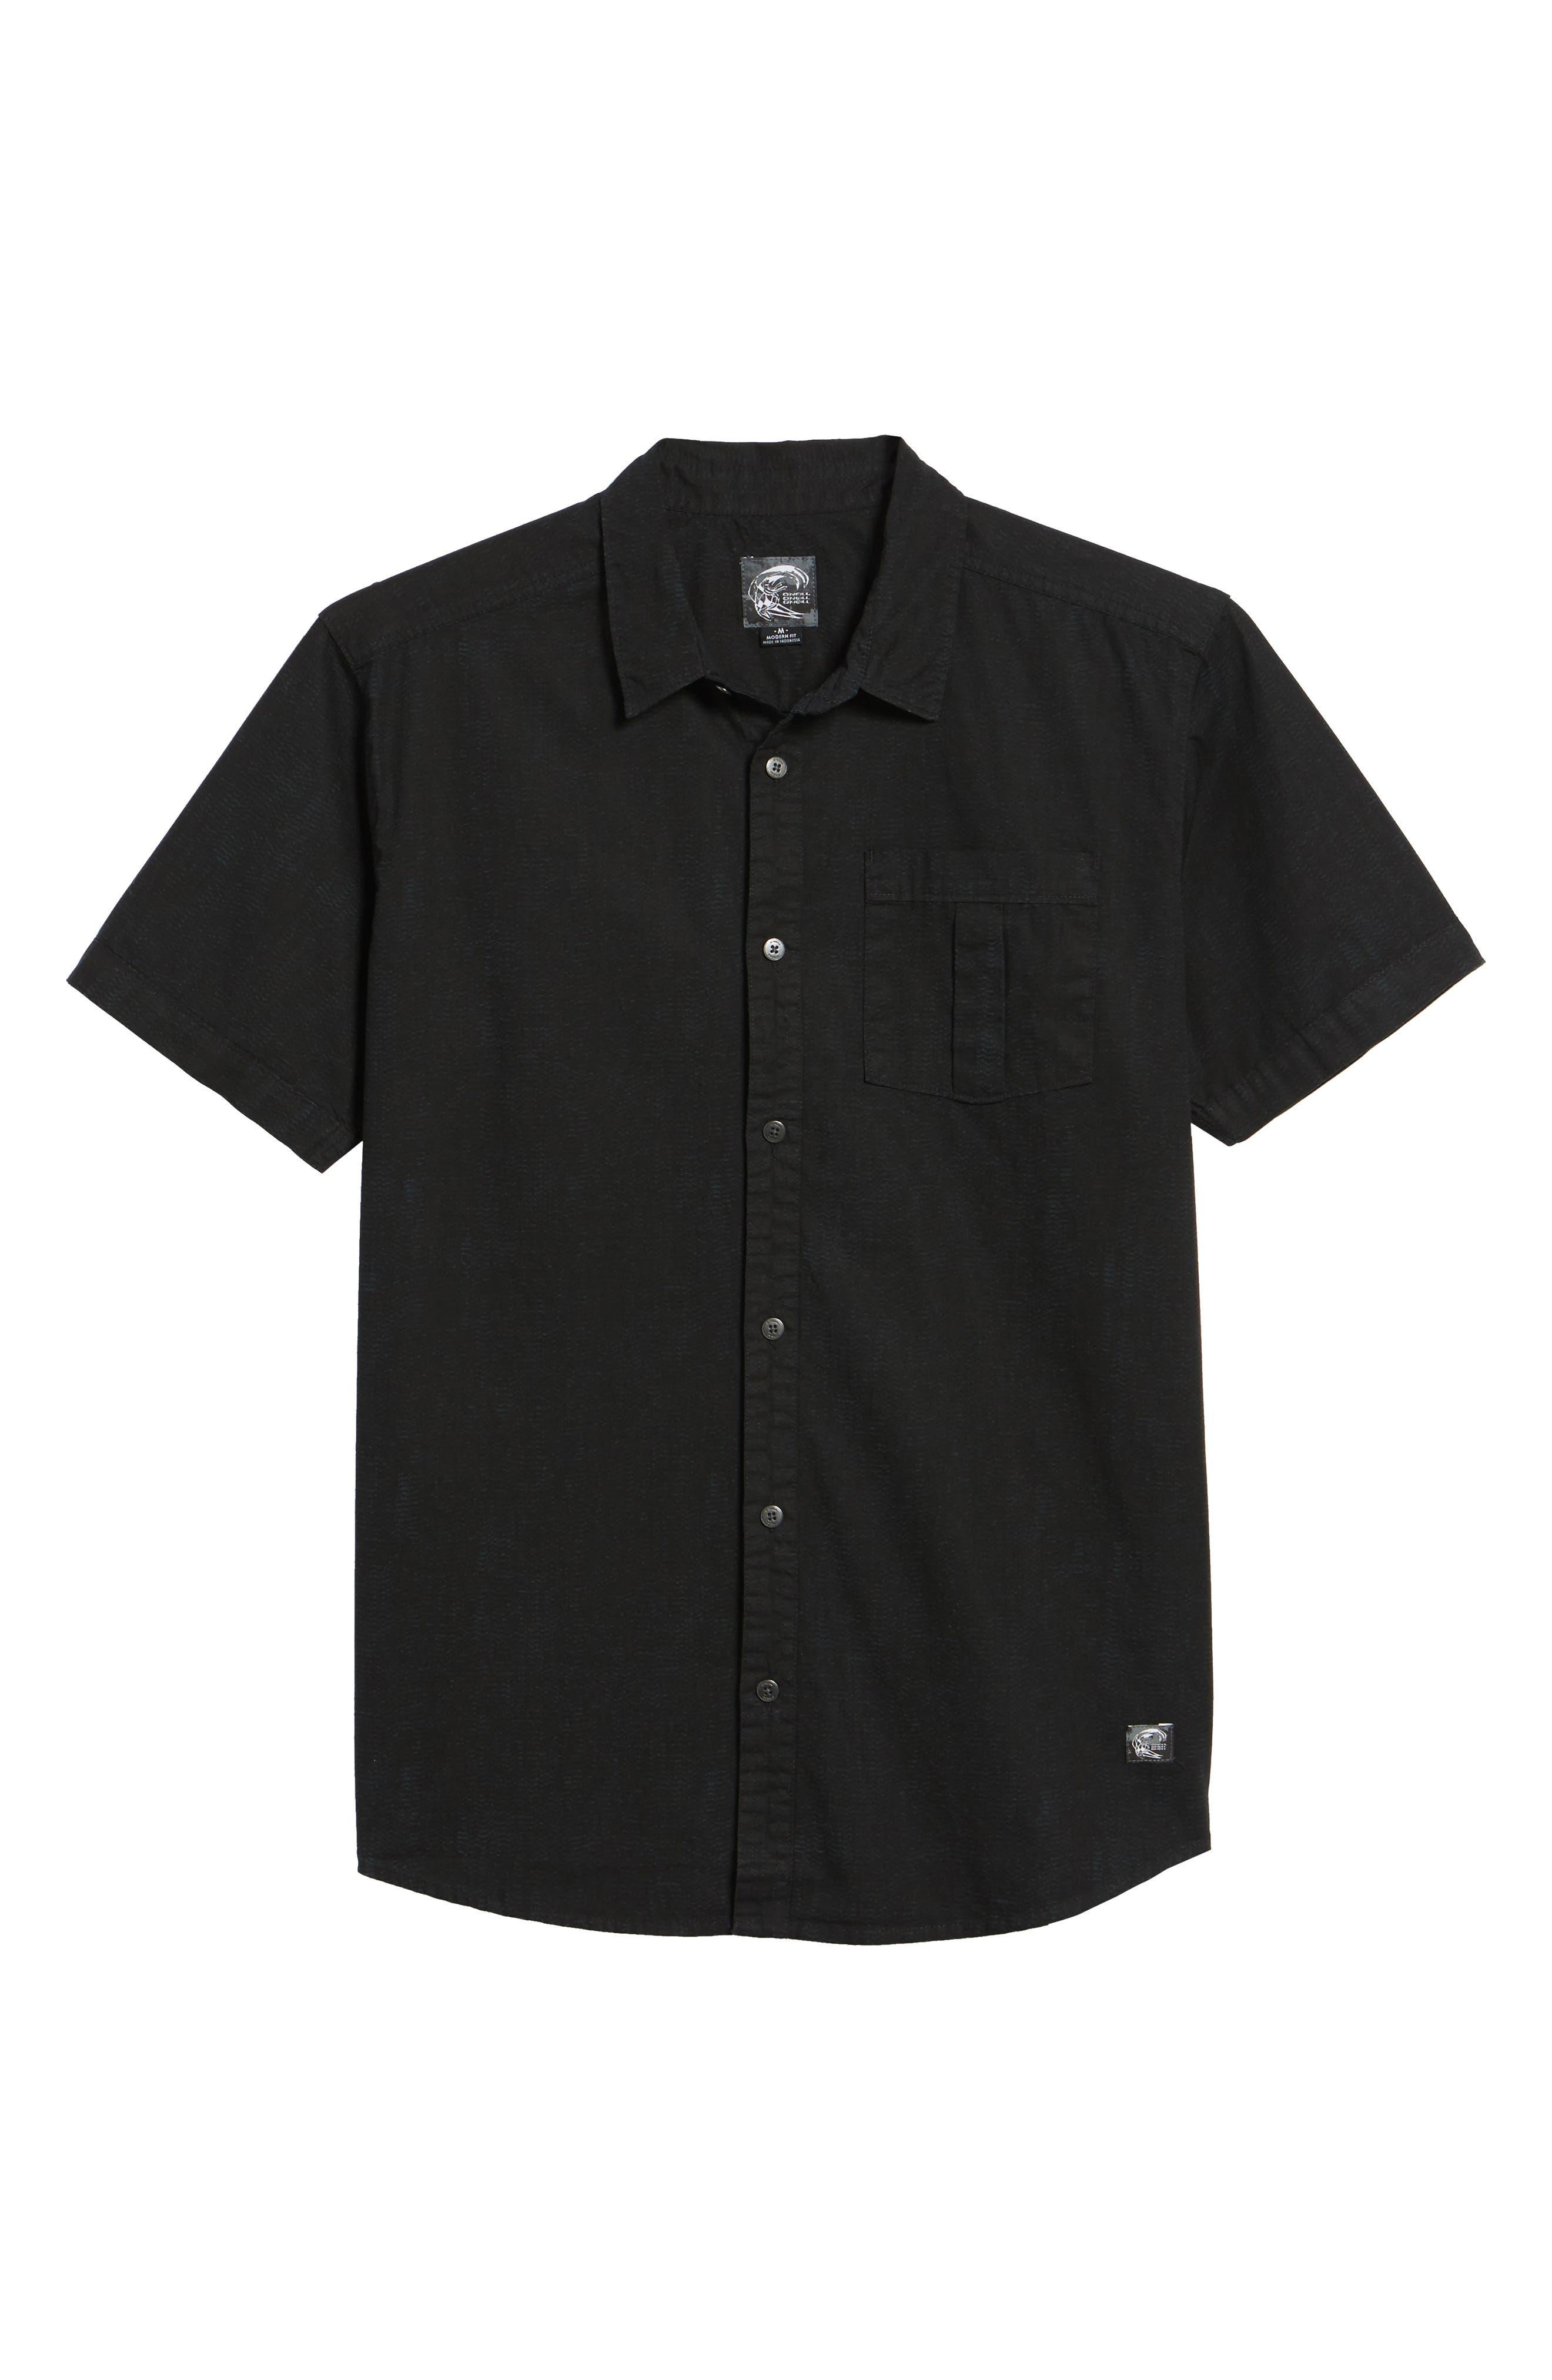 Untitled Woven Shirt,                             Alternate thumbnail 6, color,                             Black